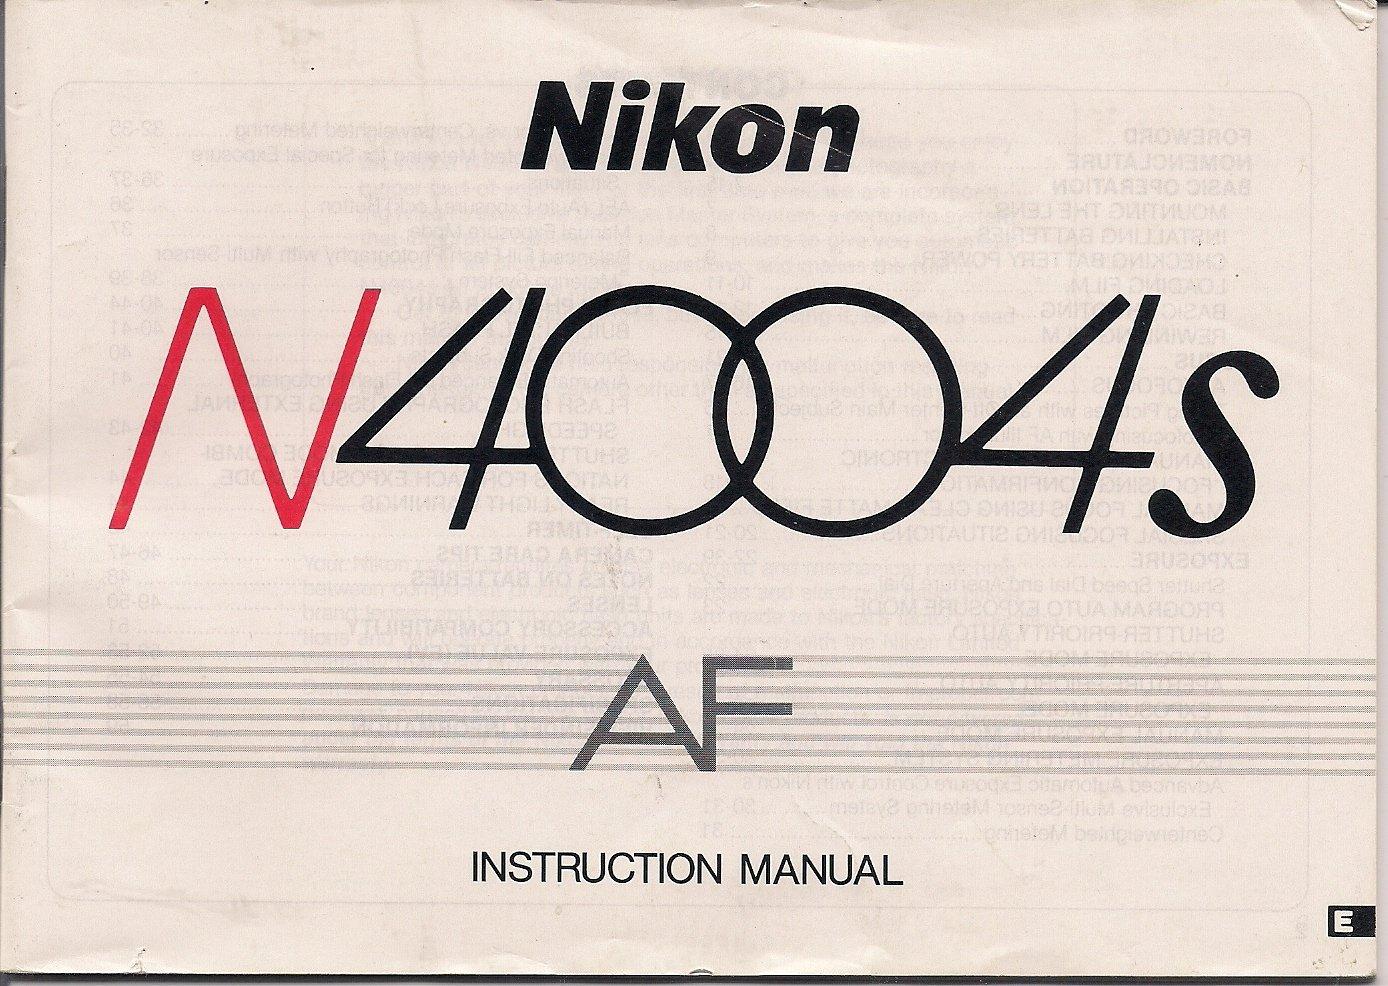 nikon n4004s af camera instruction manual nikon amazon com books rh amazon com Nikon N4004s 35Mm Camera Nikon F401